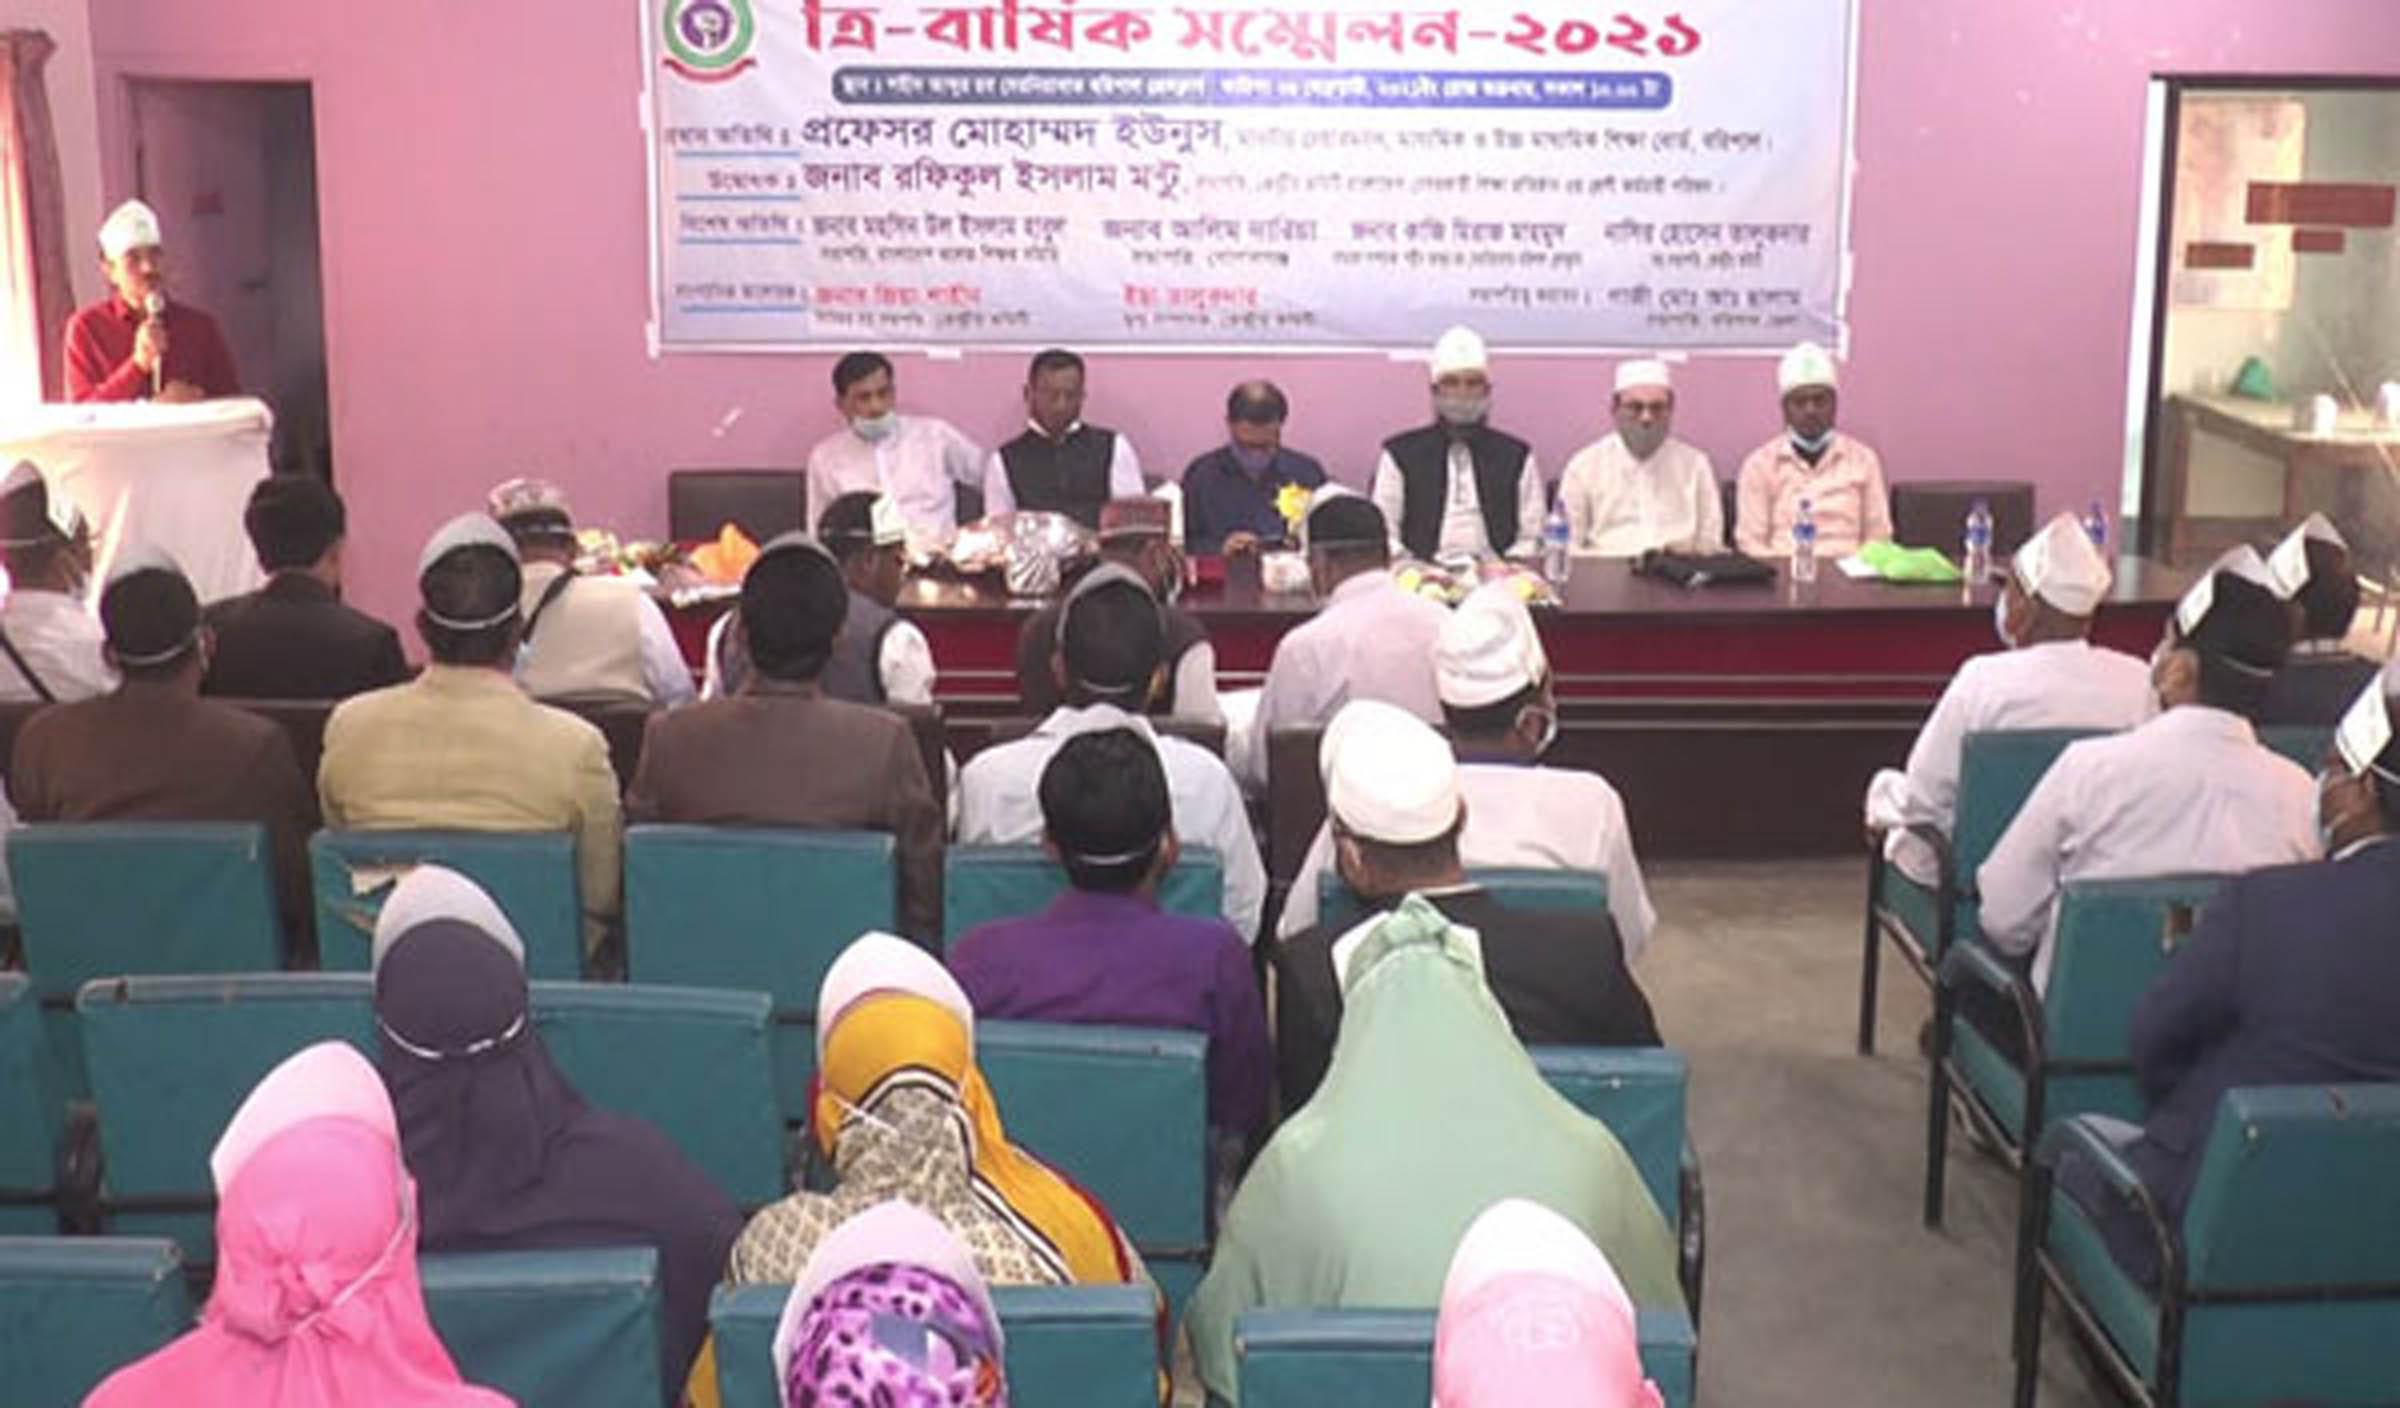 Photo of বরিশালে ত্রি-বার্ষিক সম্মেলন অনুষ্ঠিত: নতুন কমিটি গঠন